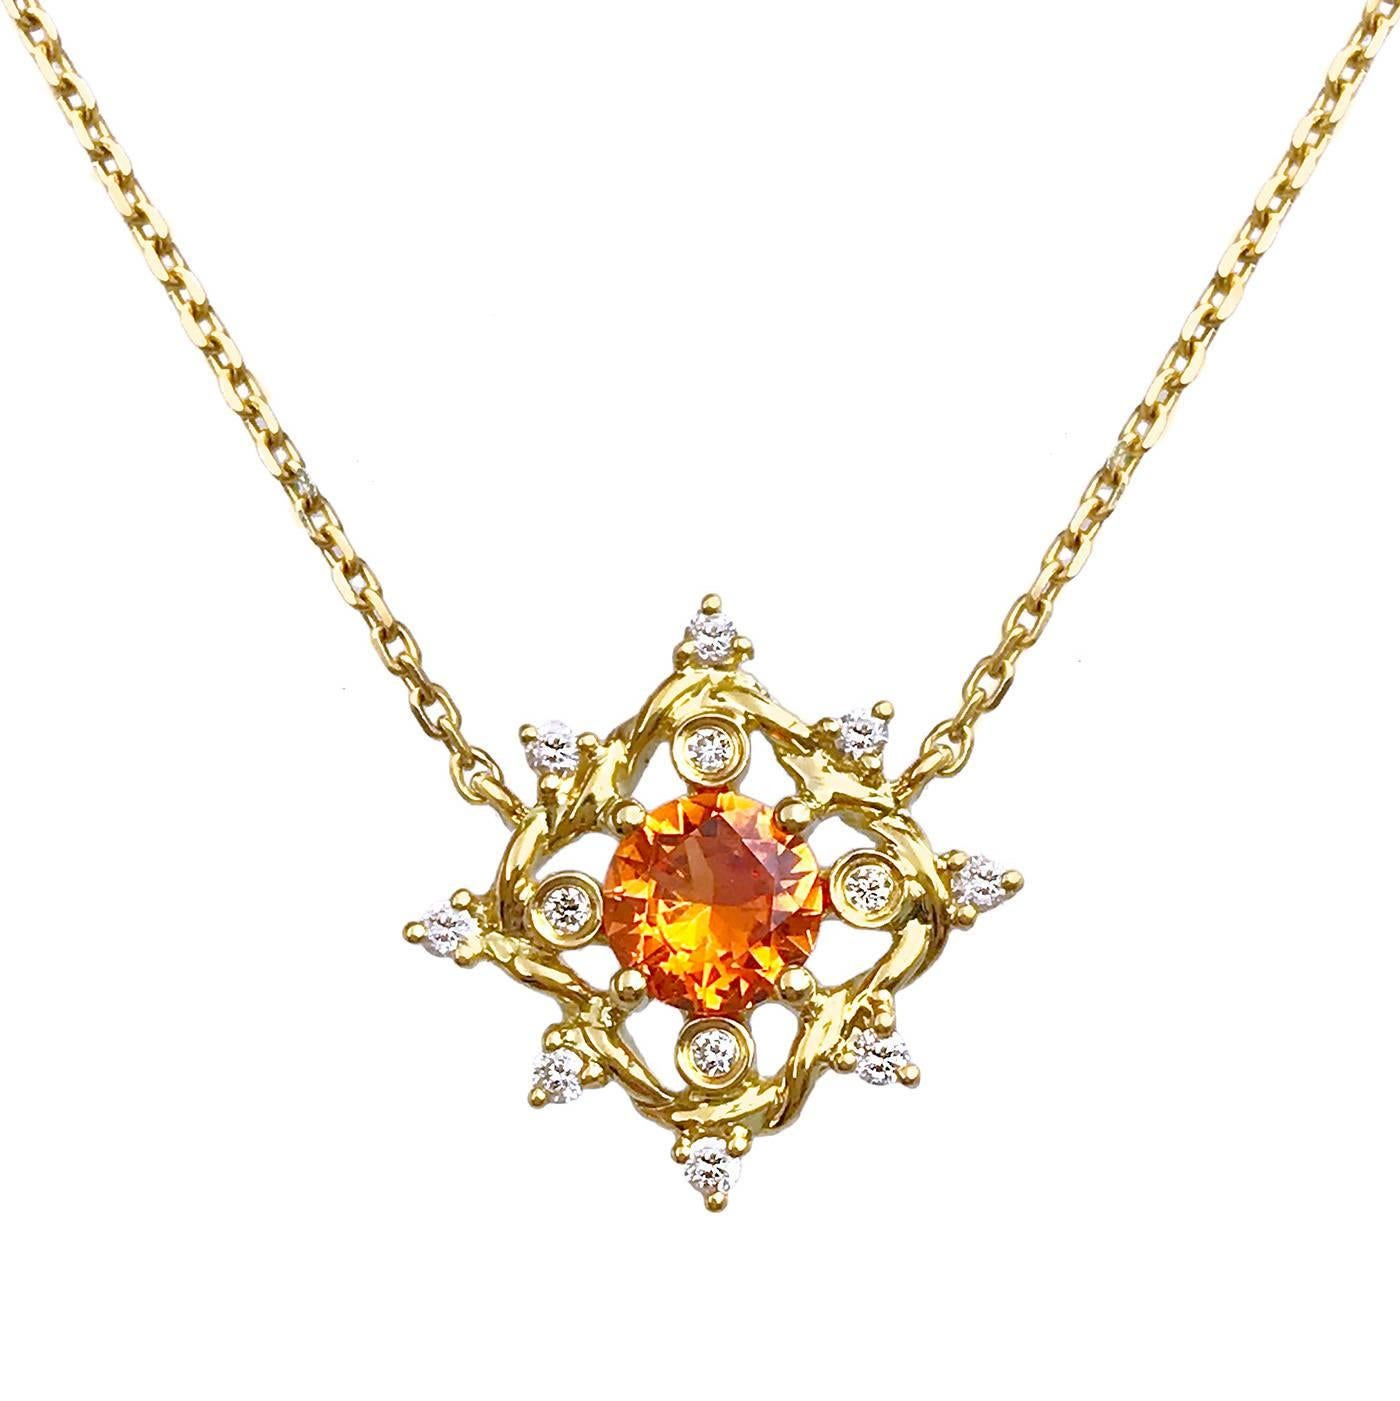 Ari Orange Sapphire Pendant Necklace 14K Yellow Gold 0.10TCW Diamonds